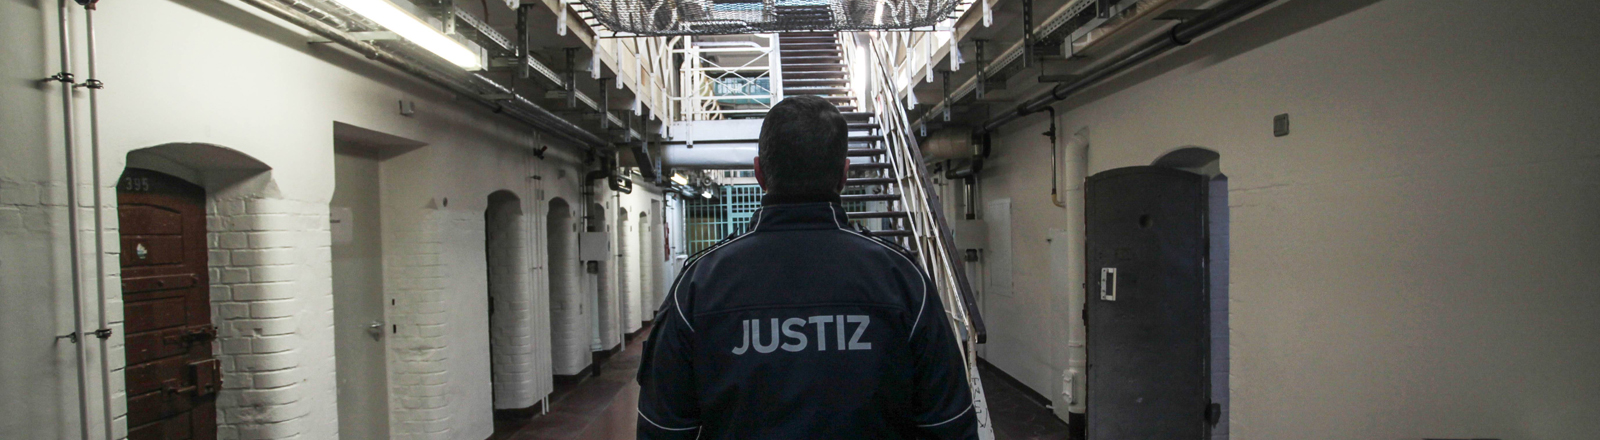 Die Justizvollzugsanstalt Berlin Tegel